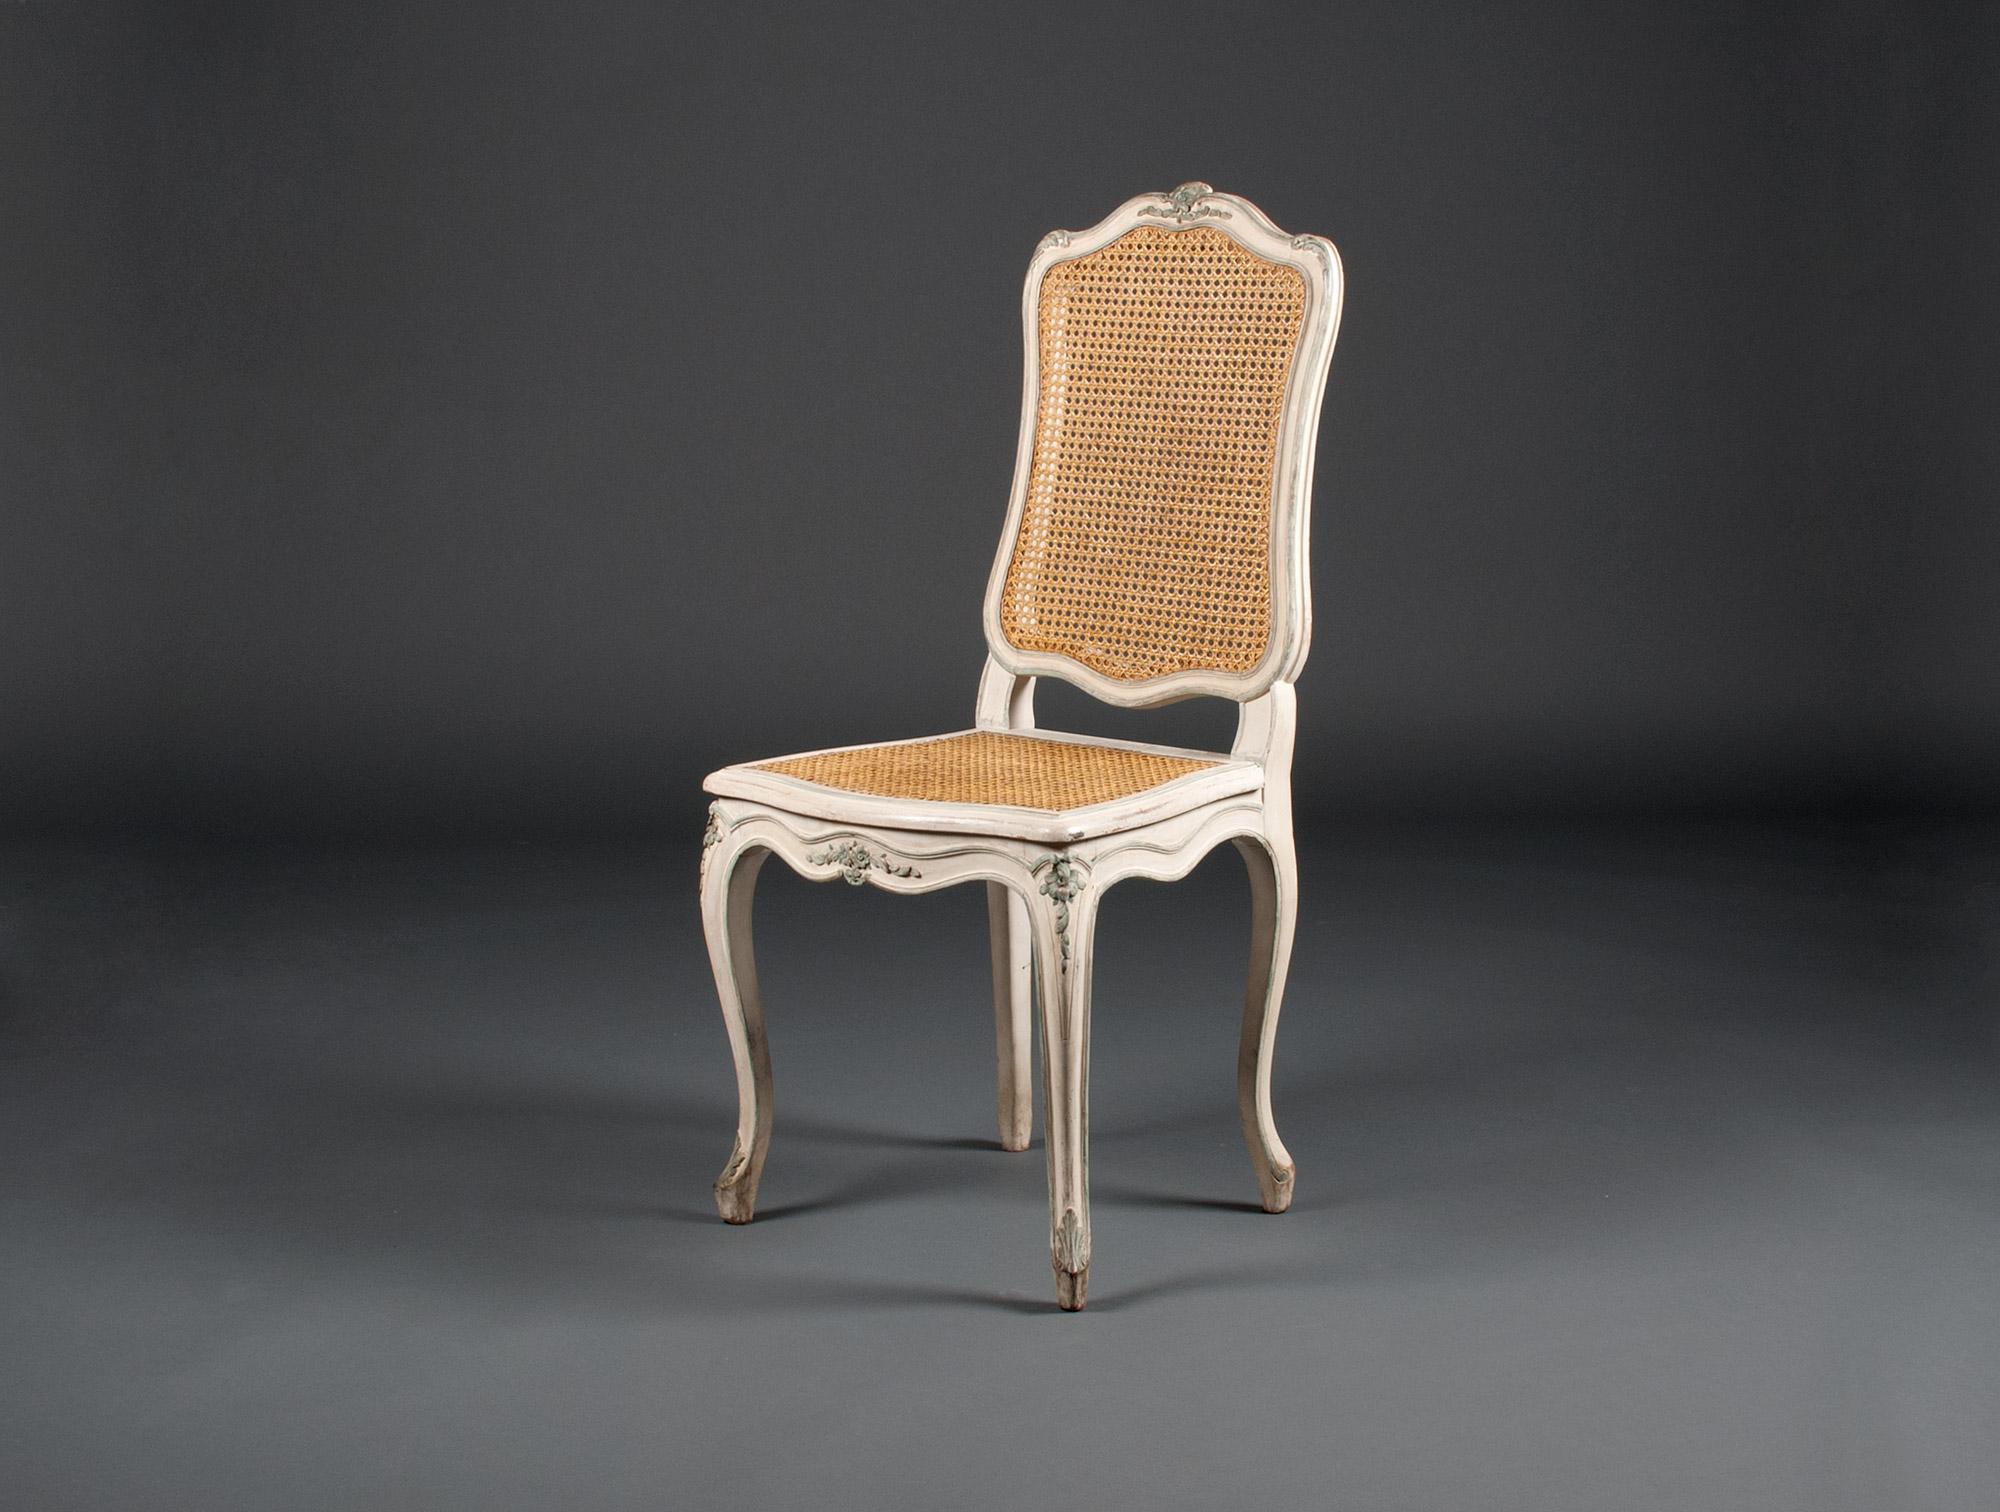 18 chaises cann es louis xv soubrier louer si ges chaise xviiie. Black Bedroom Furniture Sets. Home Design Ideas